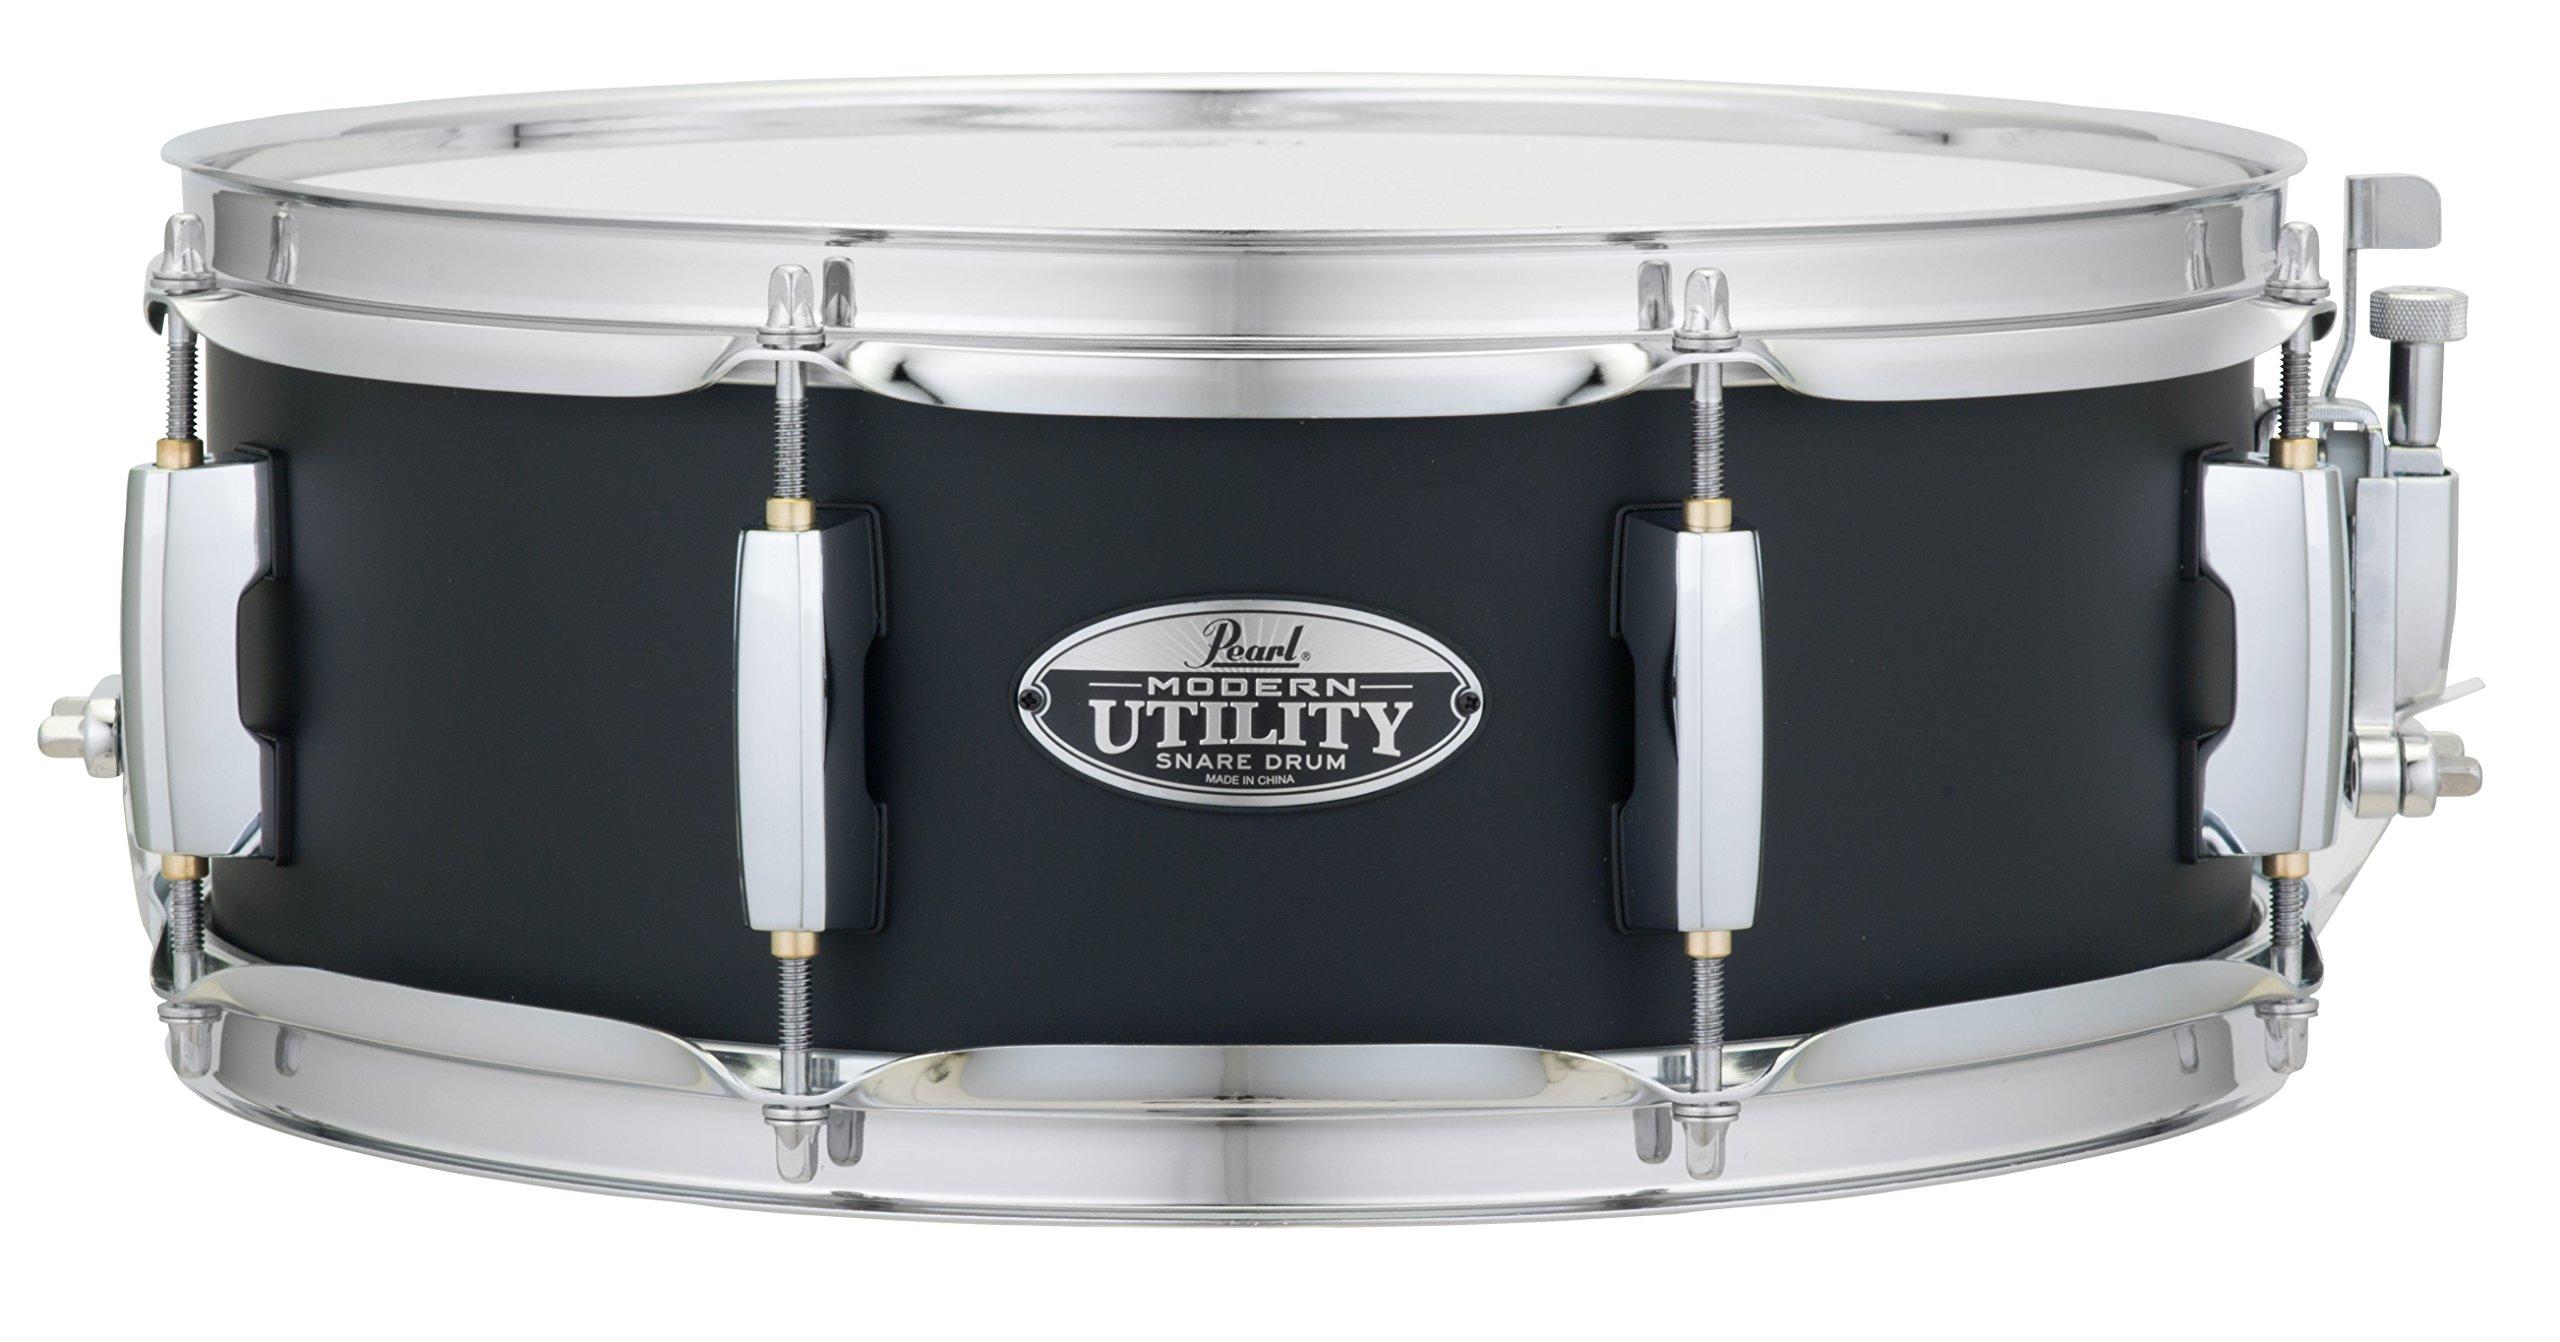 Pearl MUS1350M227 Modern Utility 13''x5'' Maple Snare Drum, Satin Black